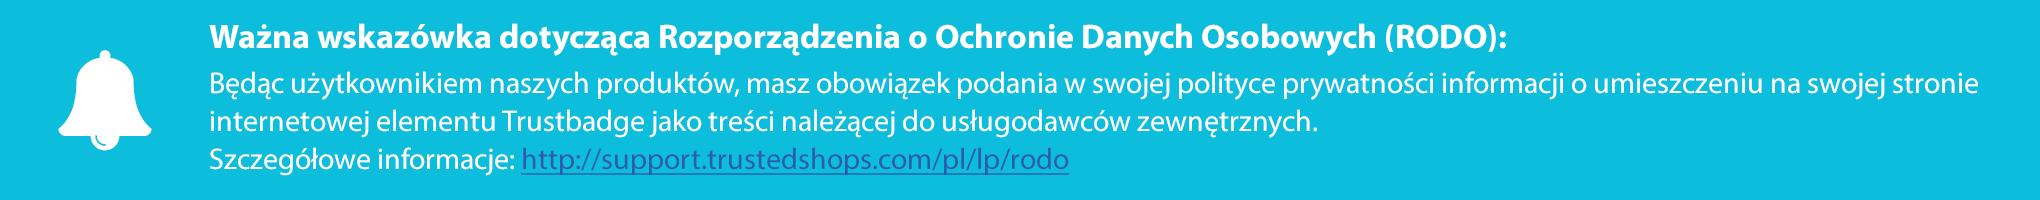 stoerer_pl.png